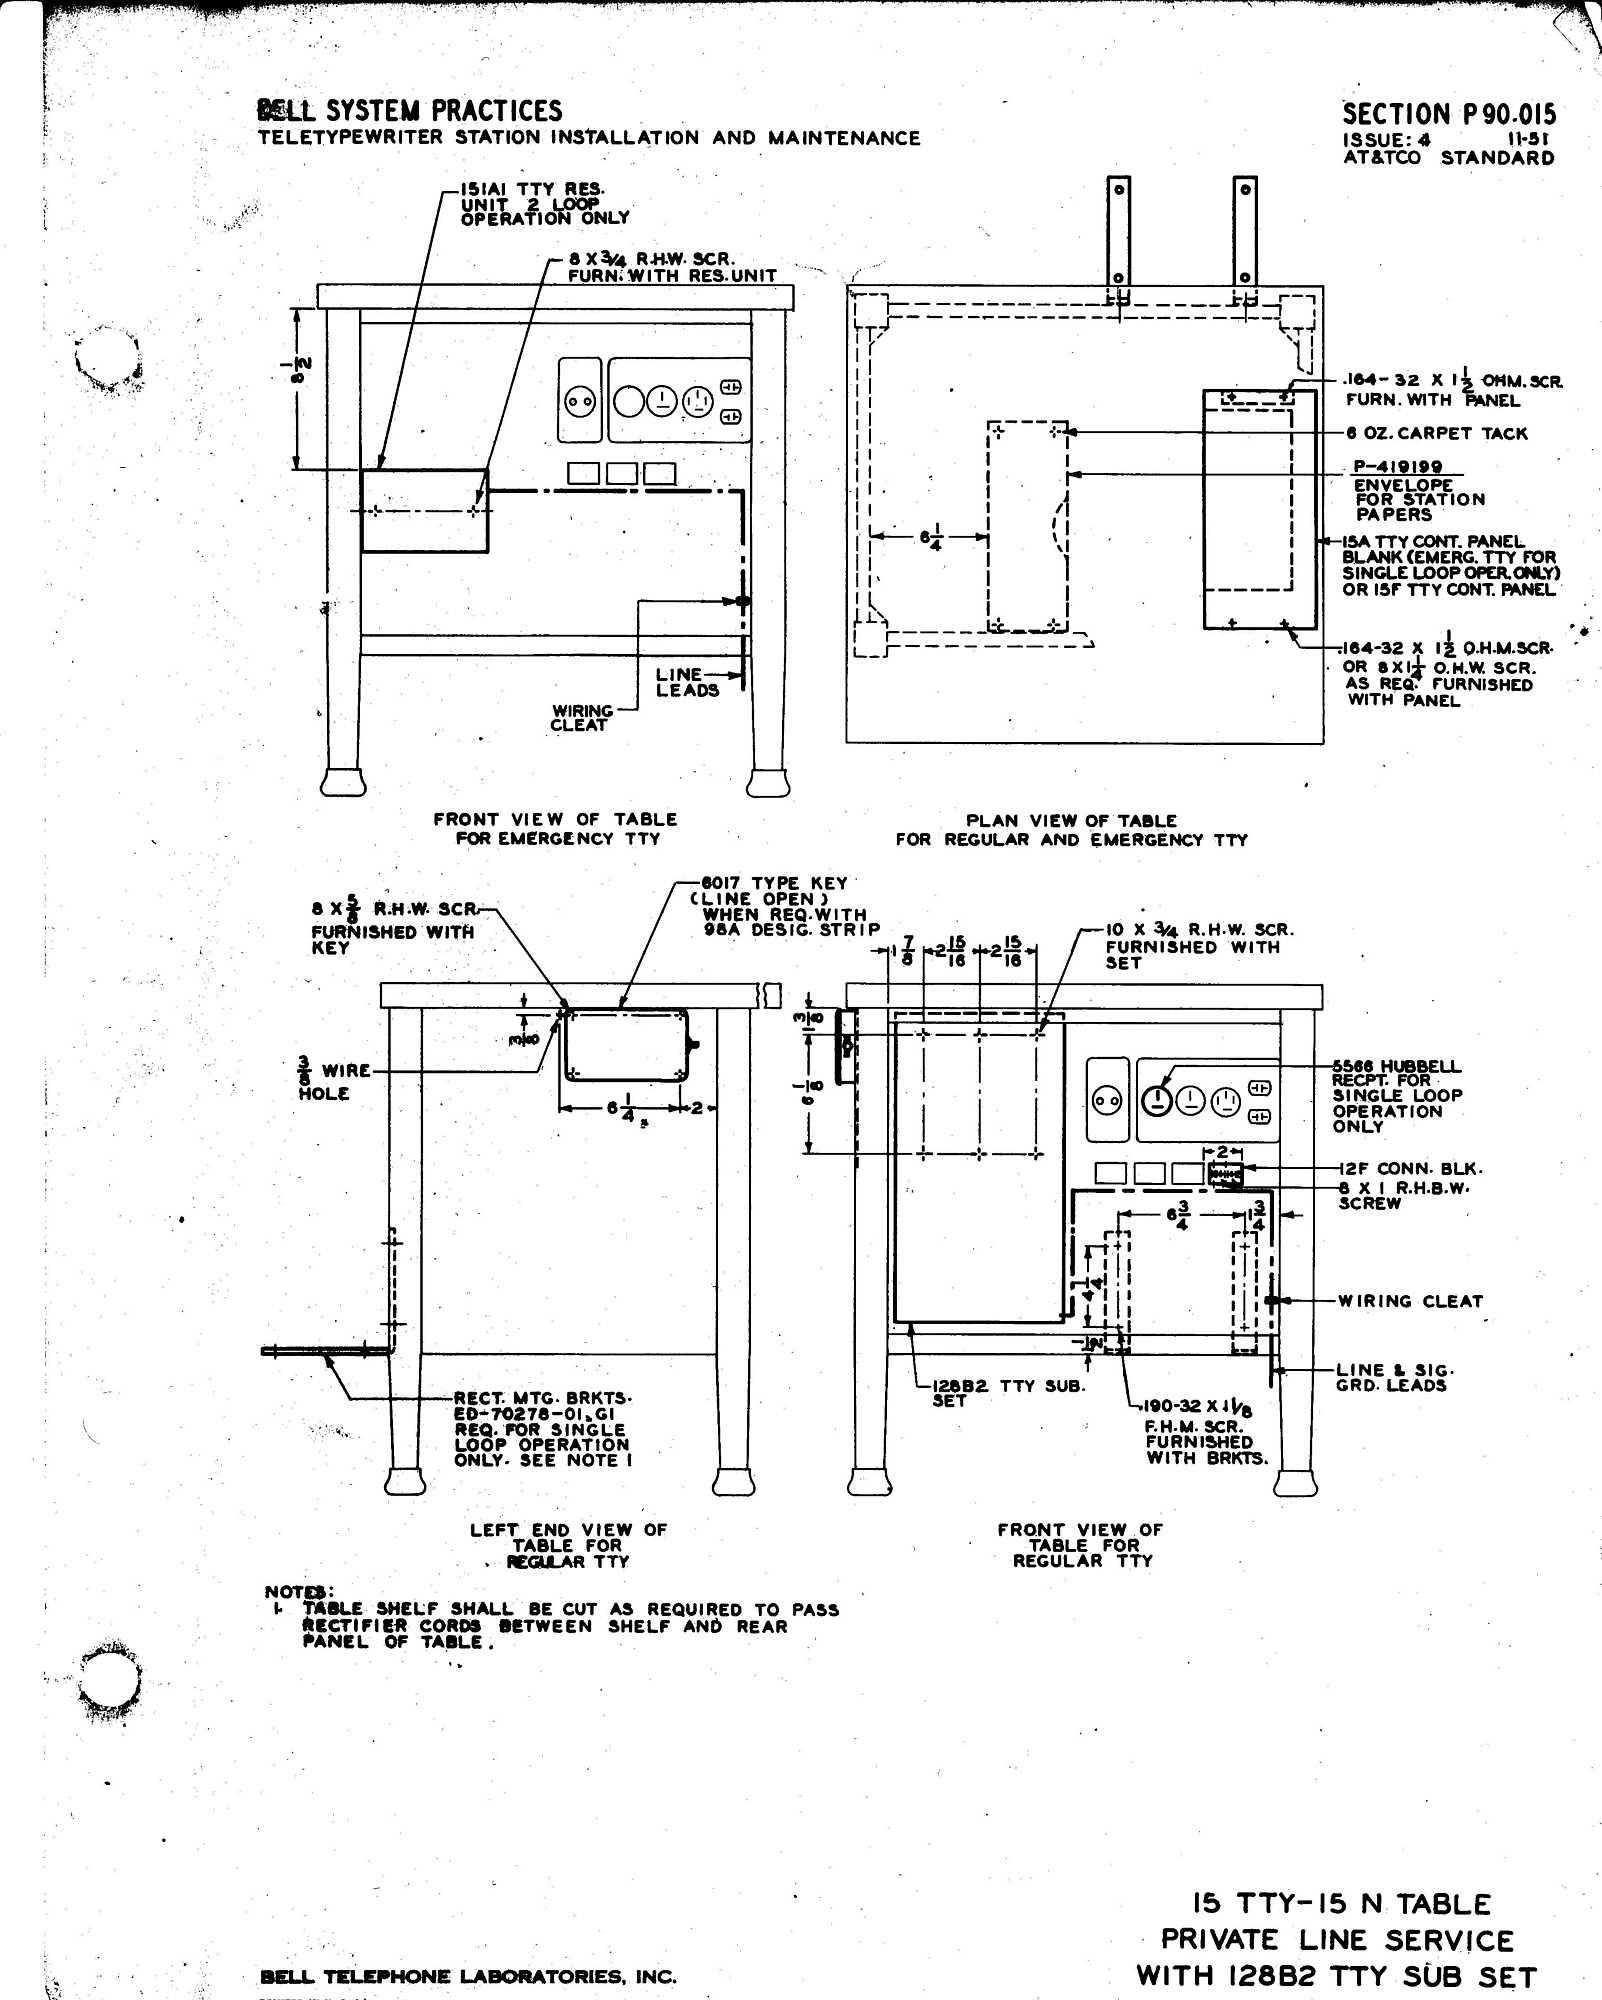 Electric Strat Wiring Diagram Polaris 500 Atv Data Simple Diagrams